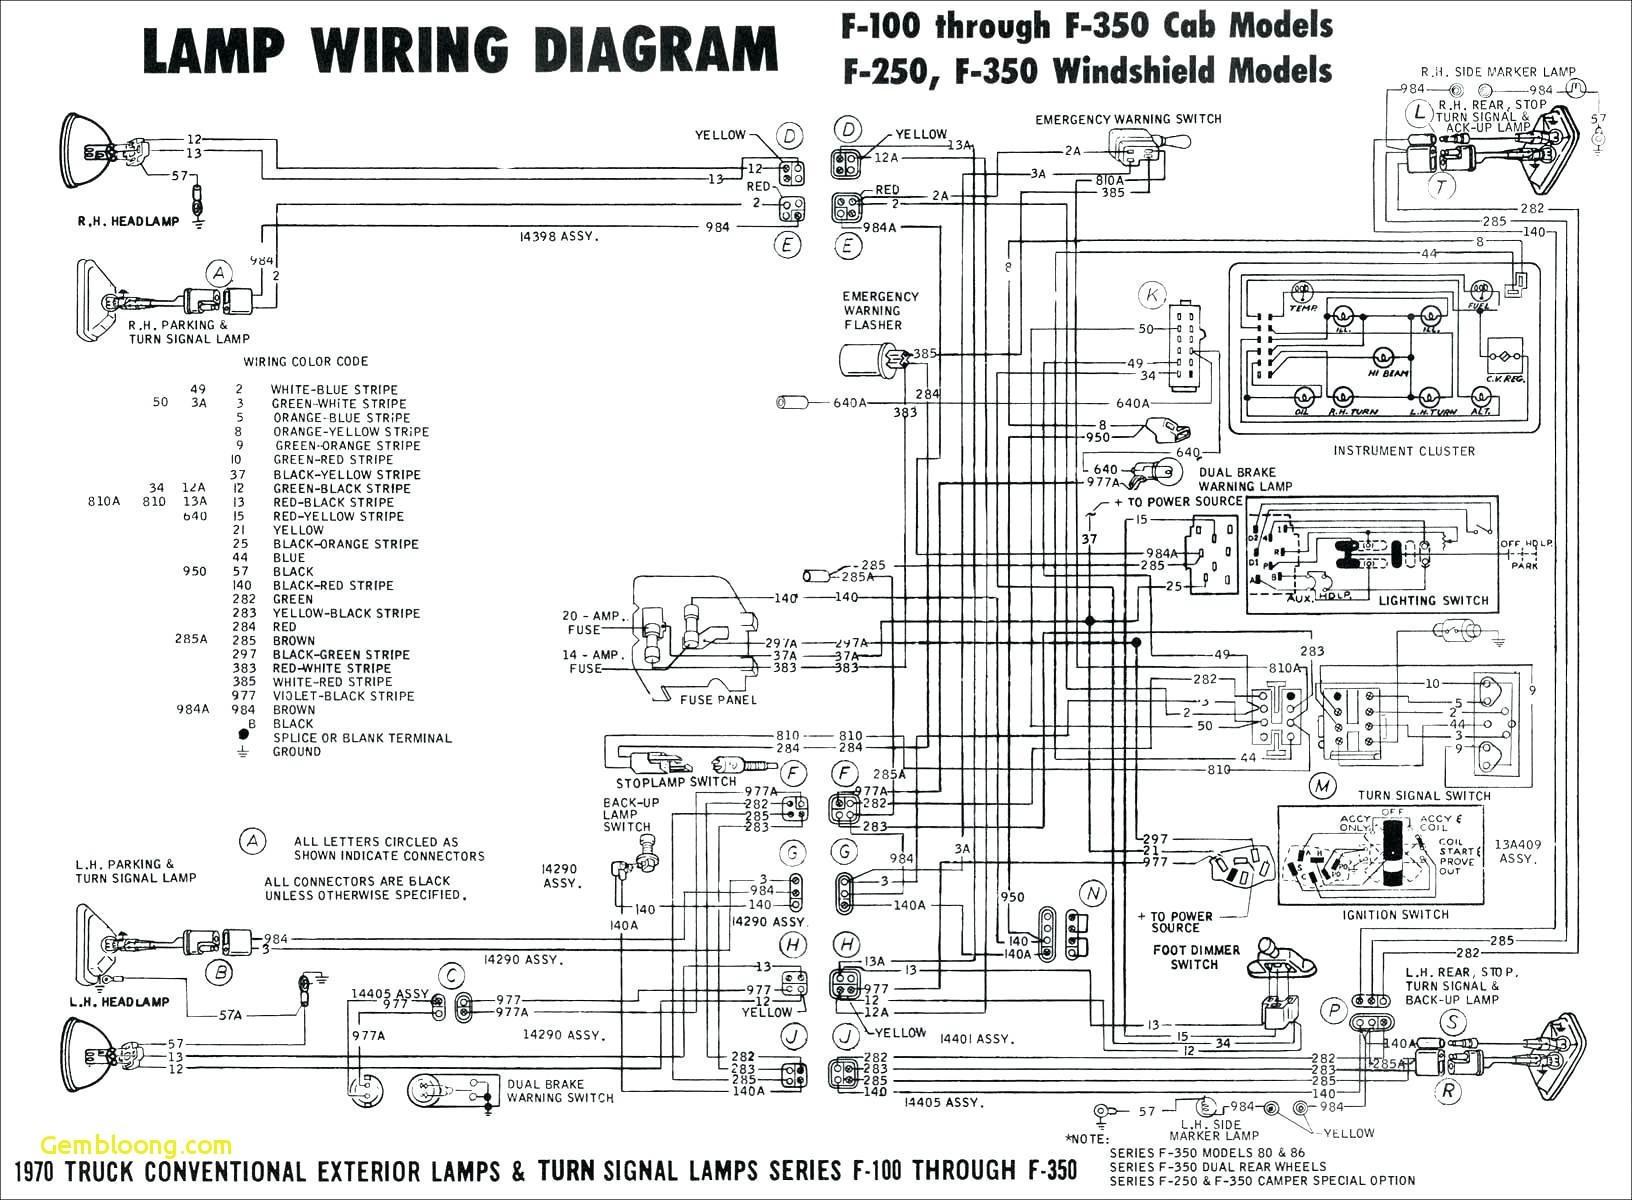 Diagram Of Car Wiring House Wiring Diagram App Best Wiring Diagram Of Diagram Of Car Wiring